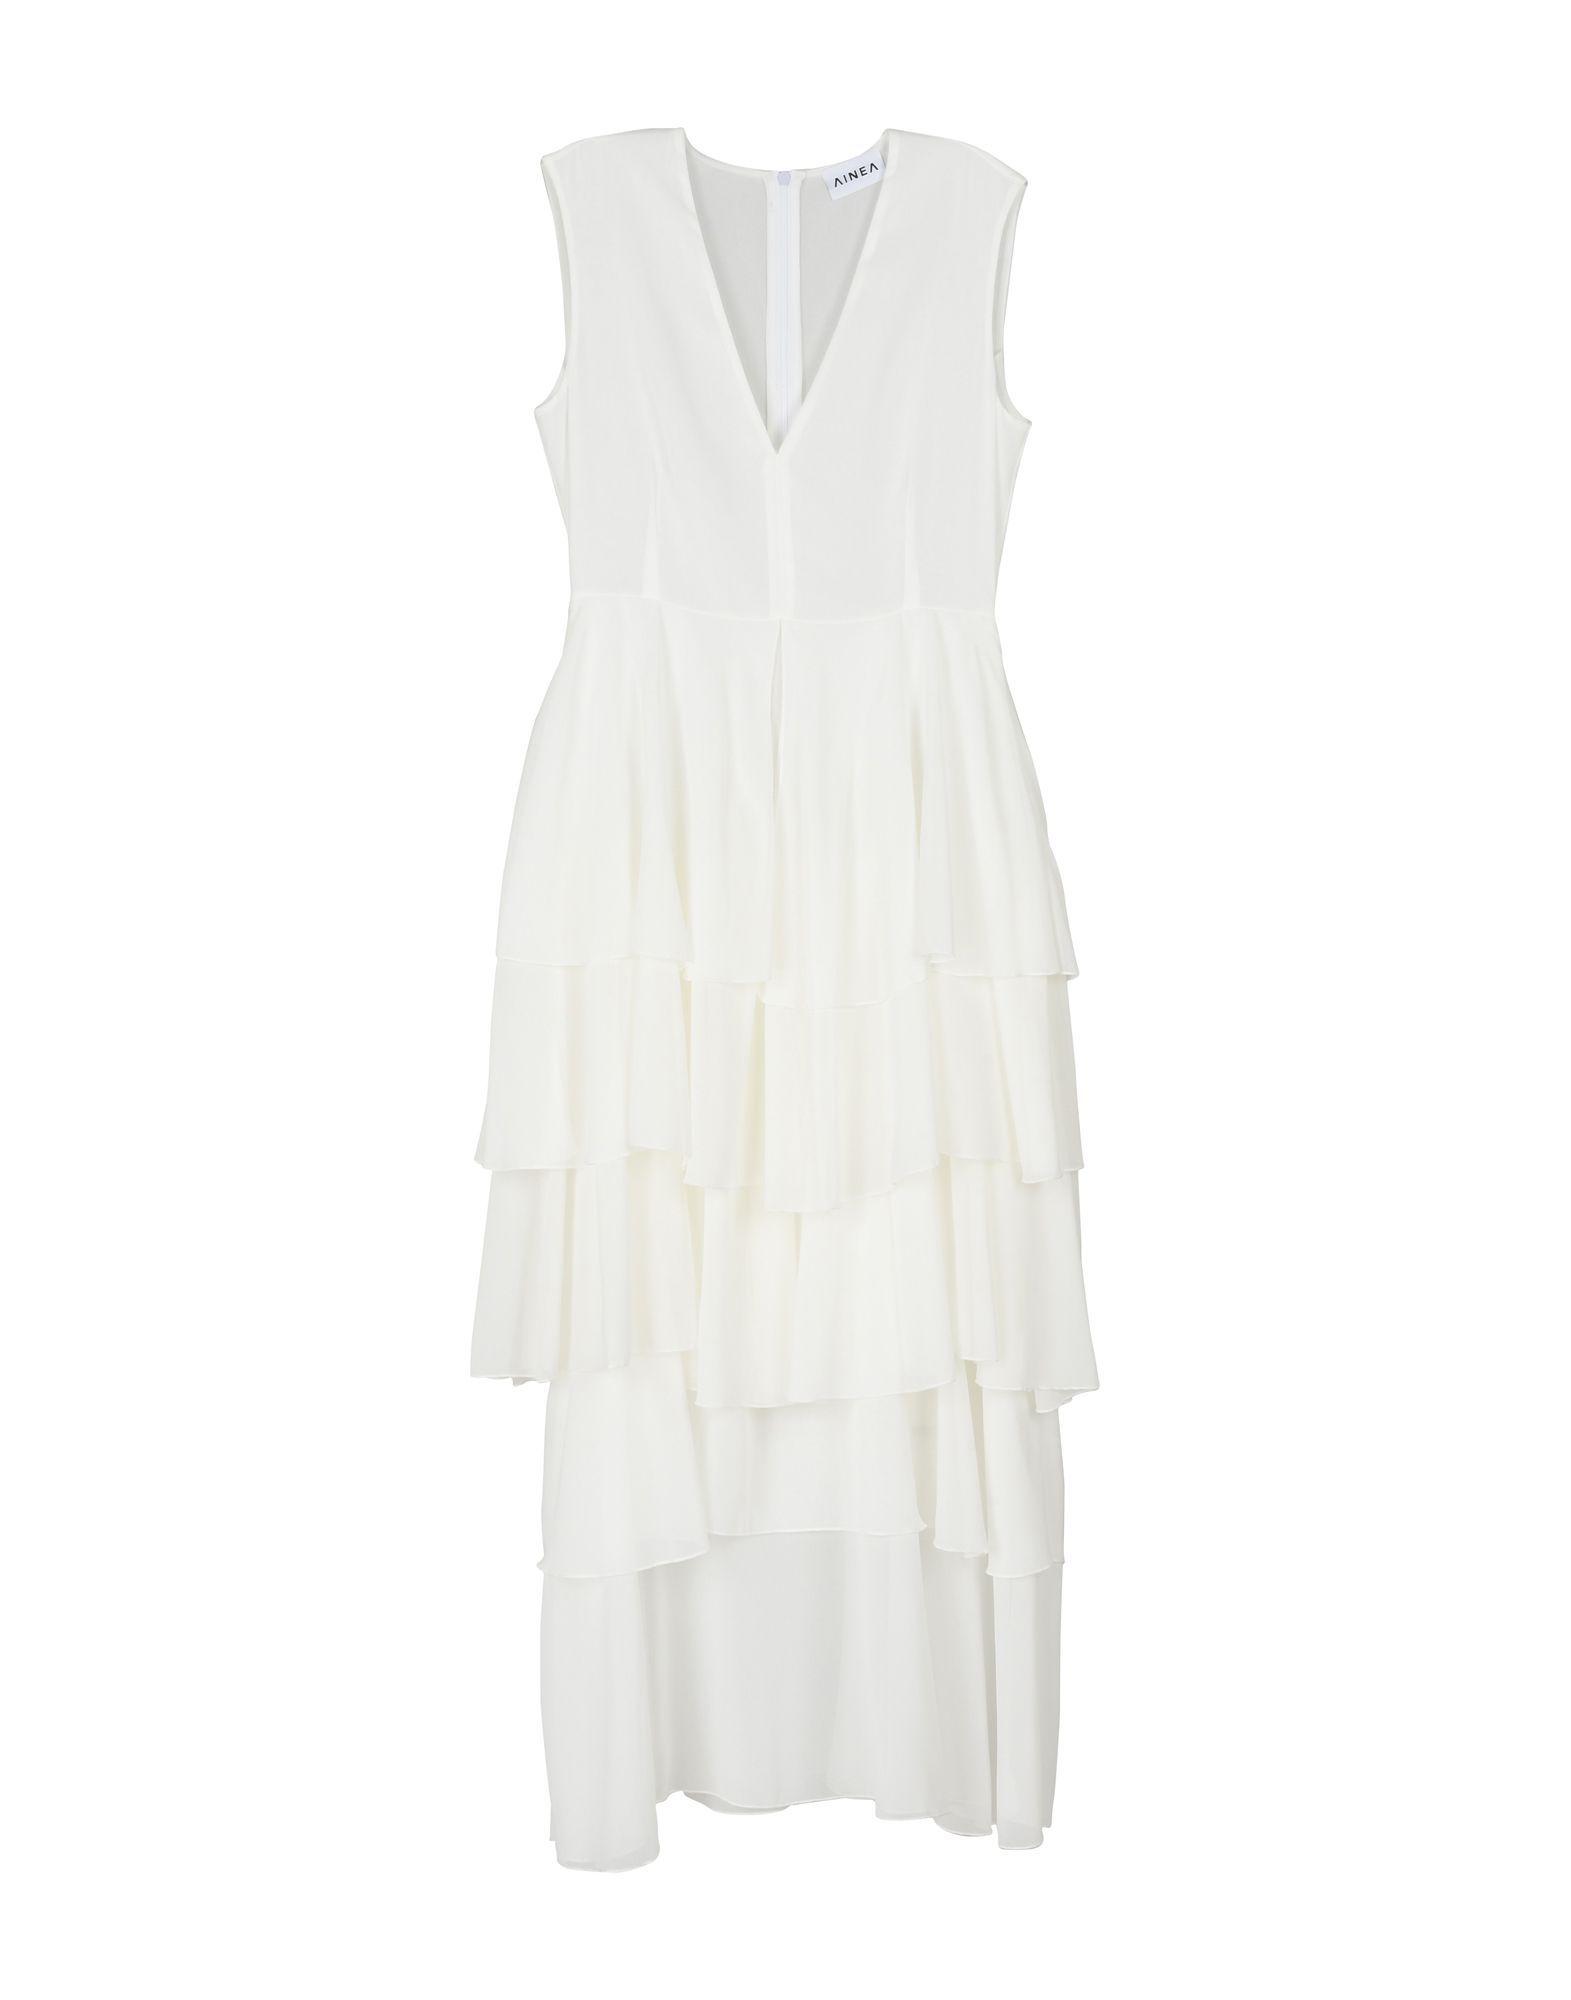 Ainea White Crepe Ruffle Dress